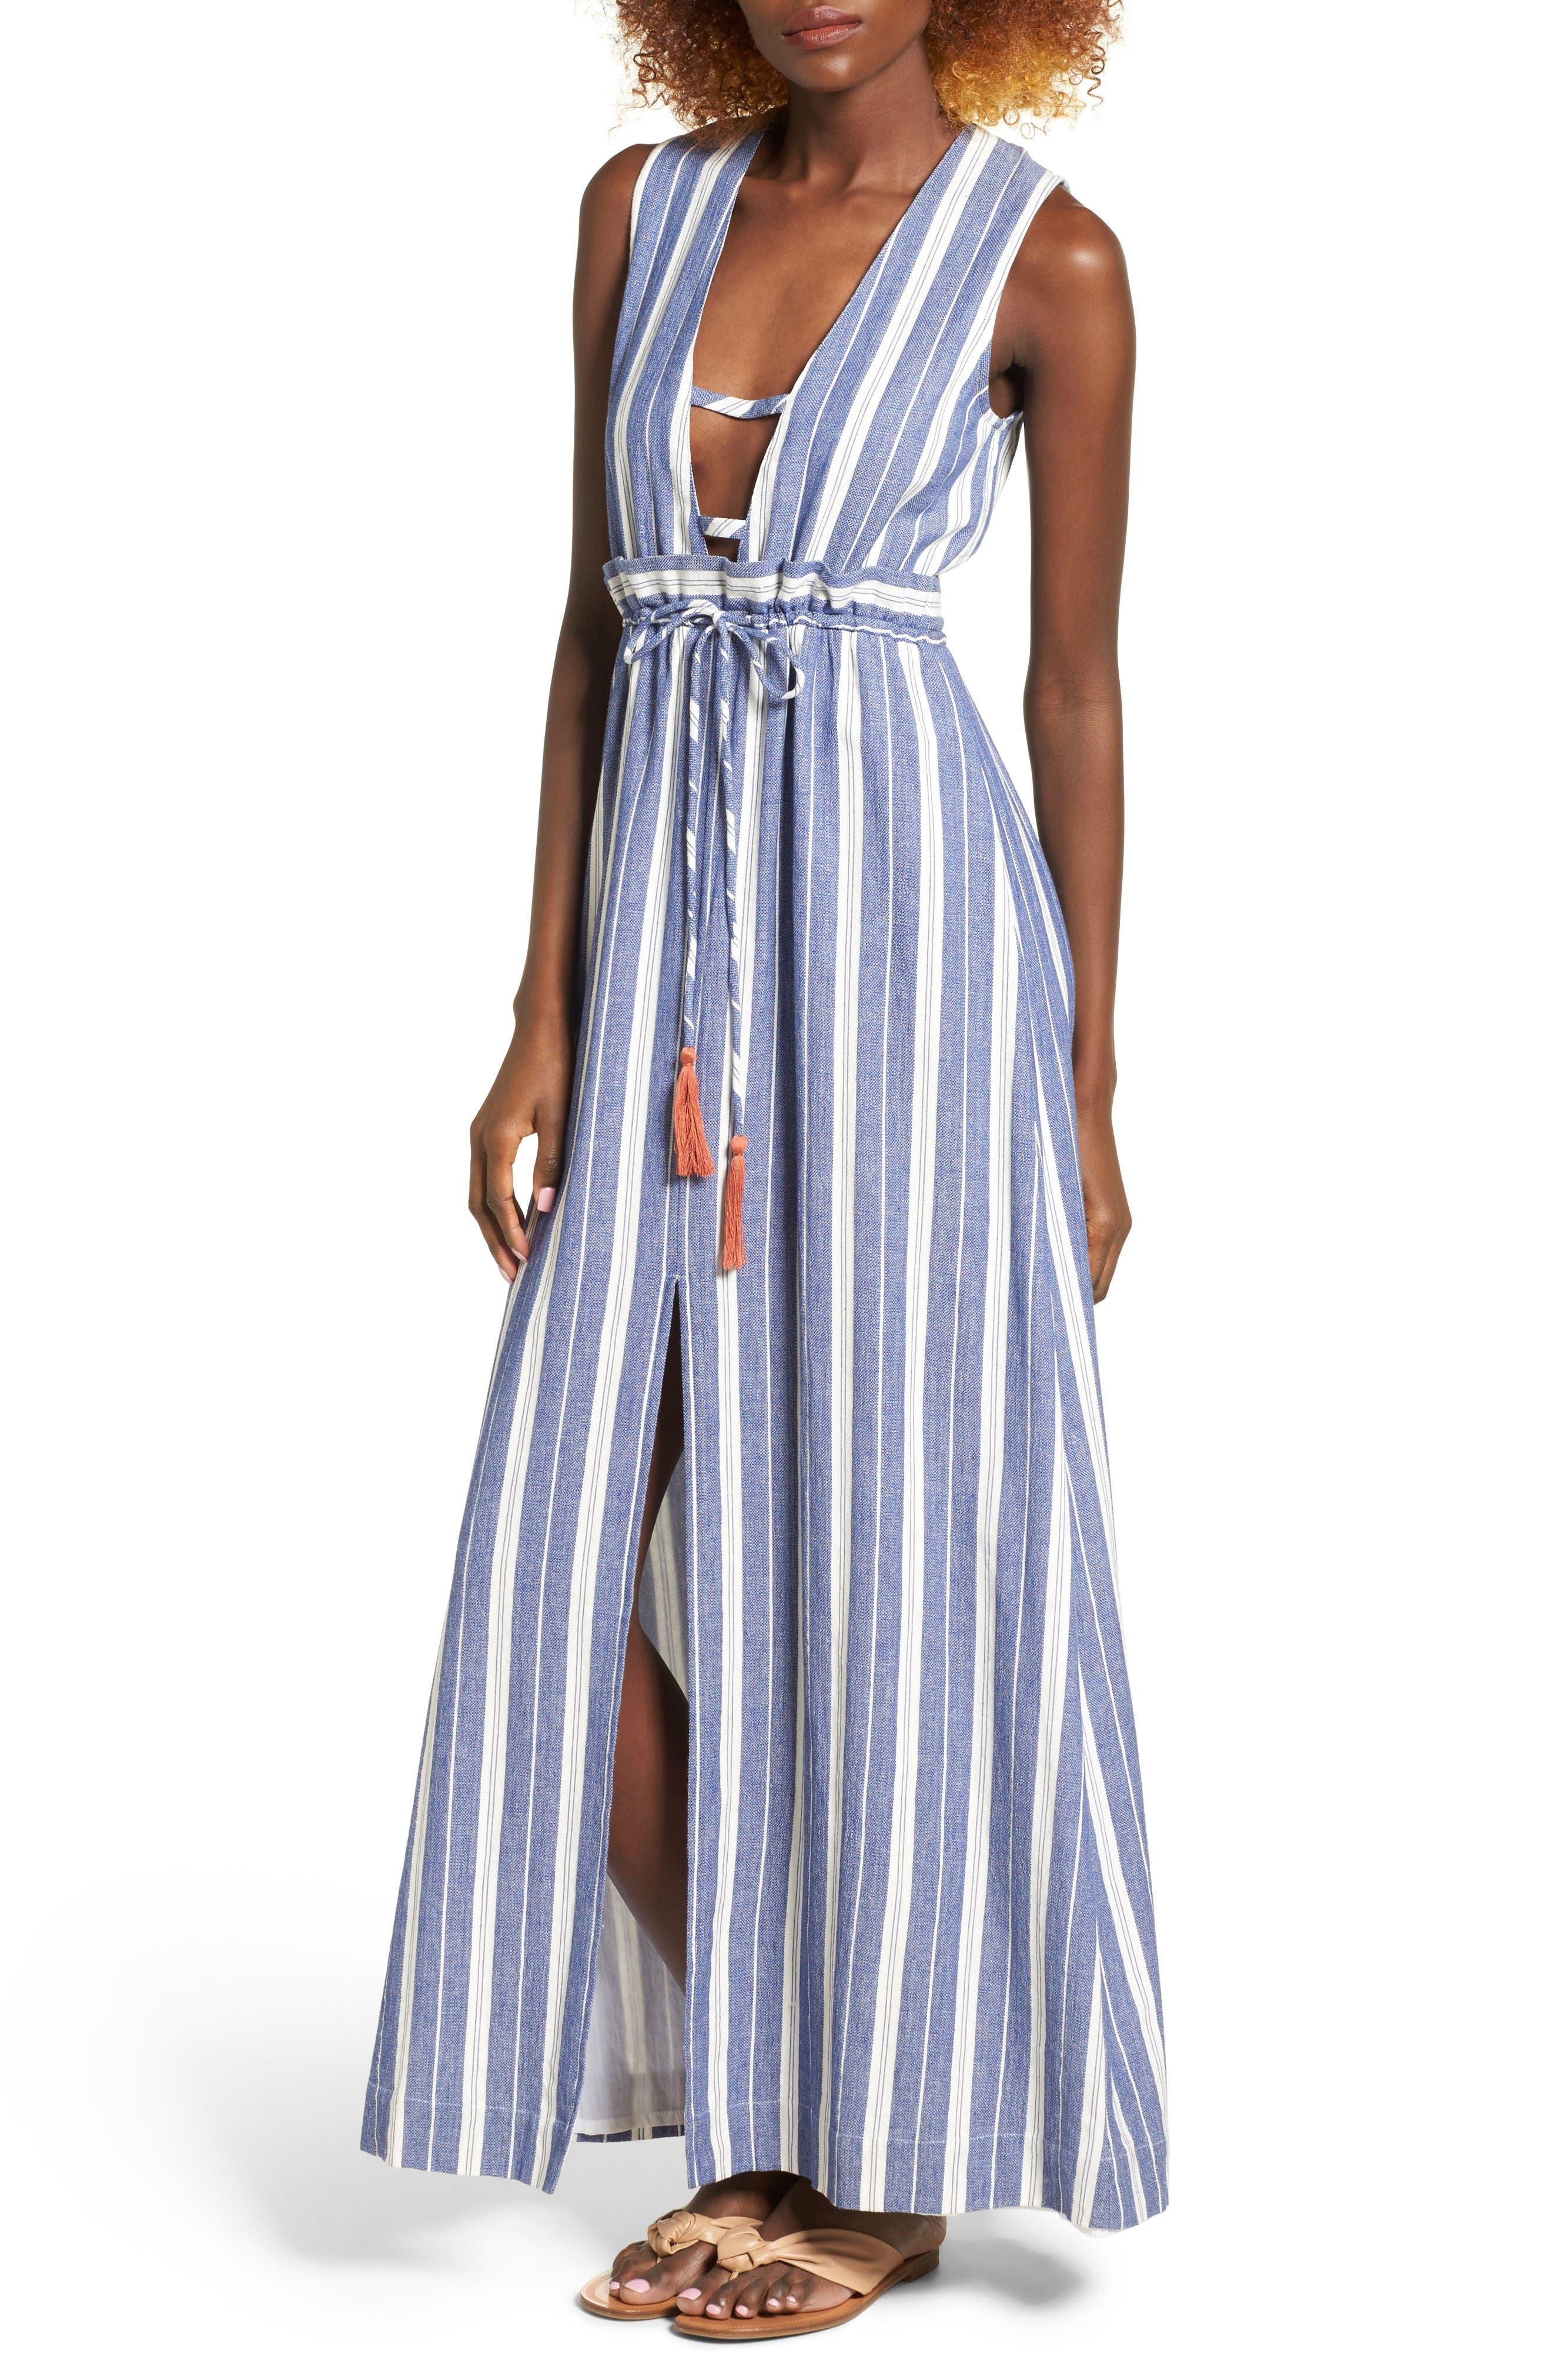 Alternate Image 1 Selected - Tularosa Essie Stripe Maxi Dress